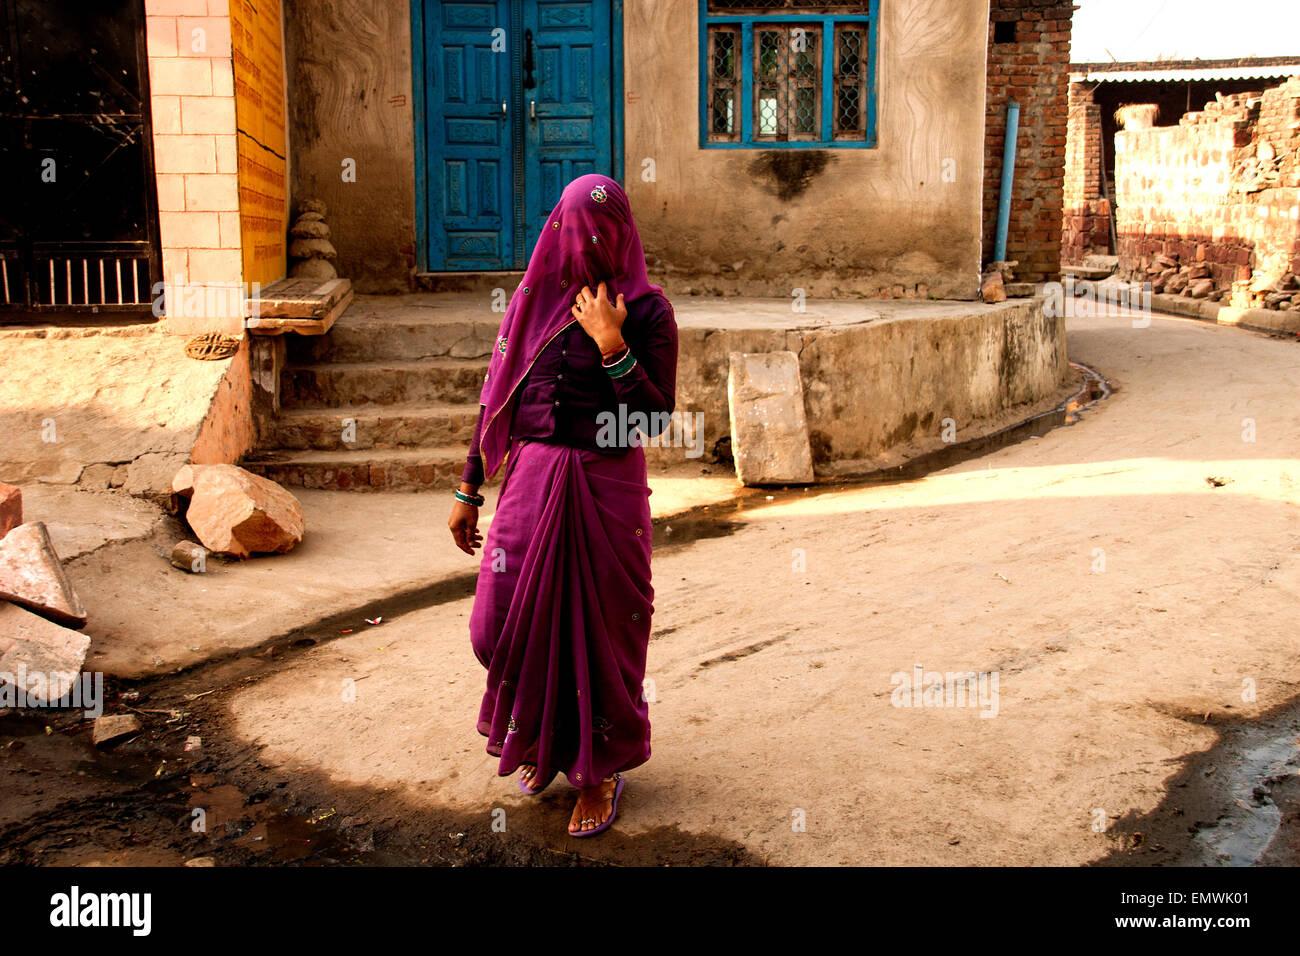 Agra, India. Street scene depicts local woman in Sari - Stock Image